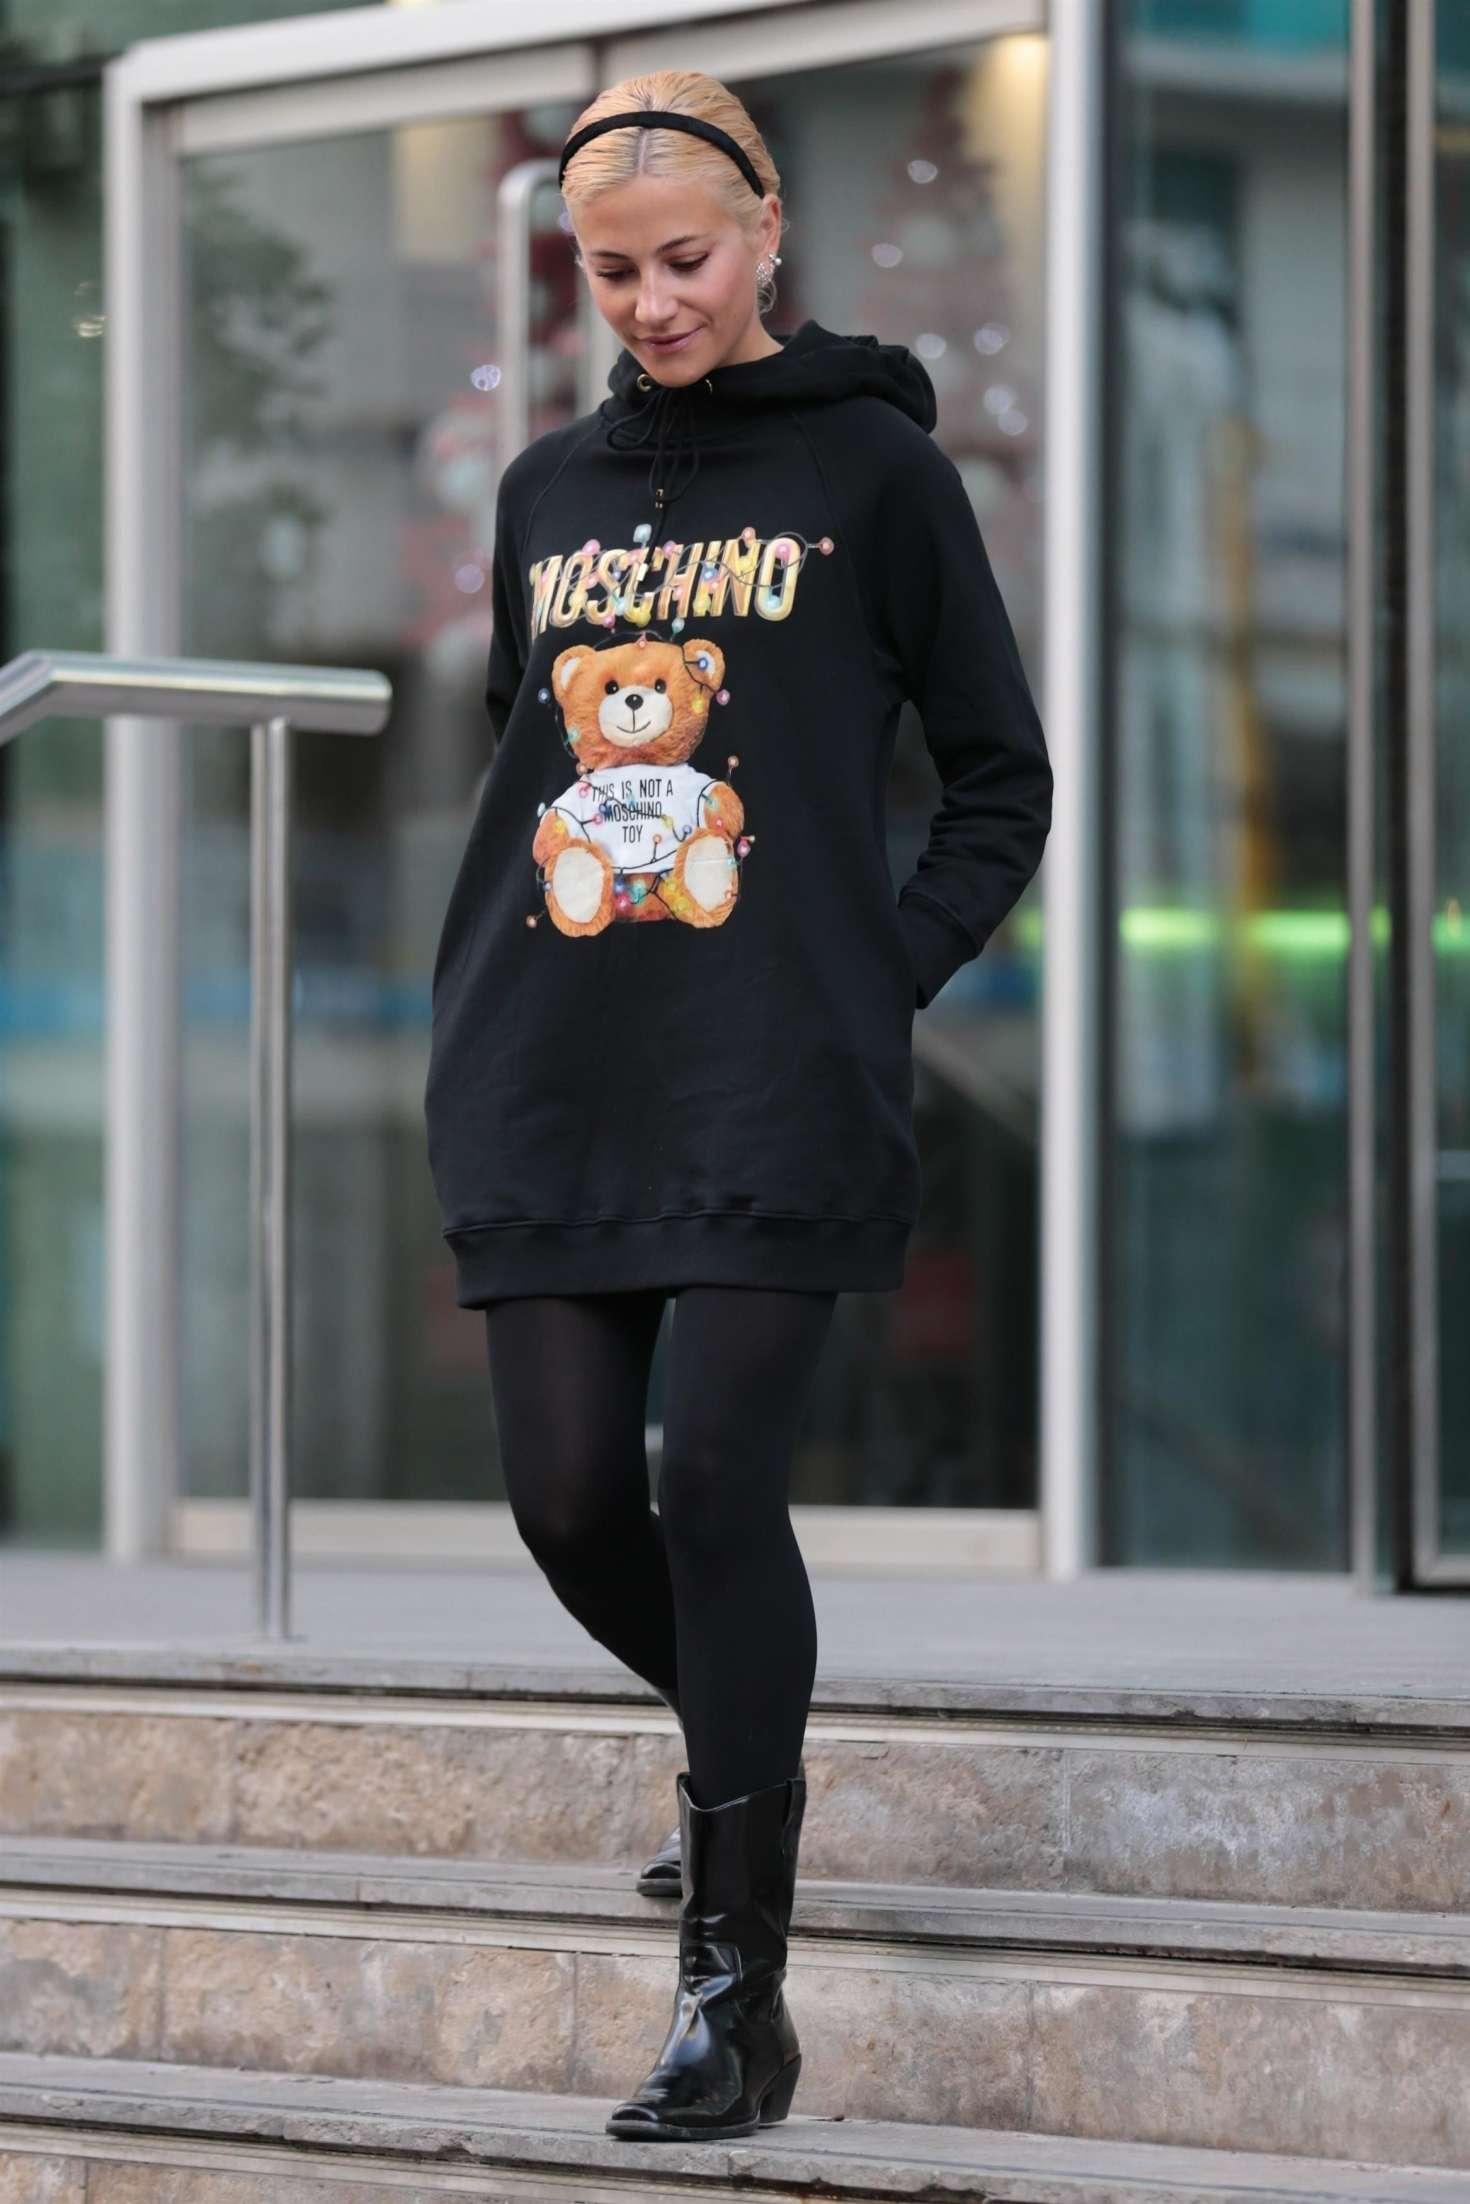 Pixie Lott 2018 : Pixie Lott: Leaving Hotel in Manchester -03